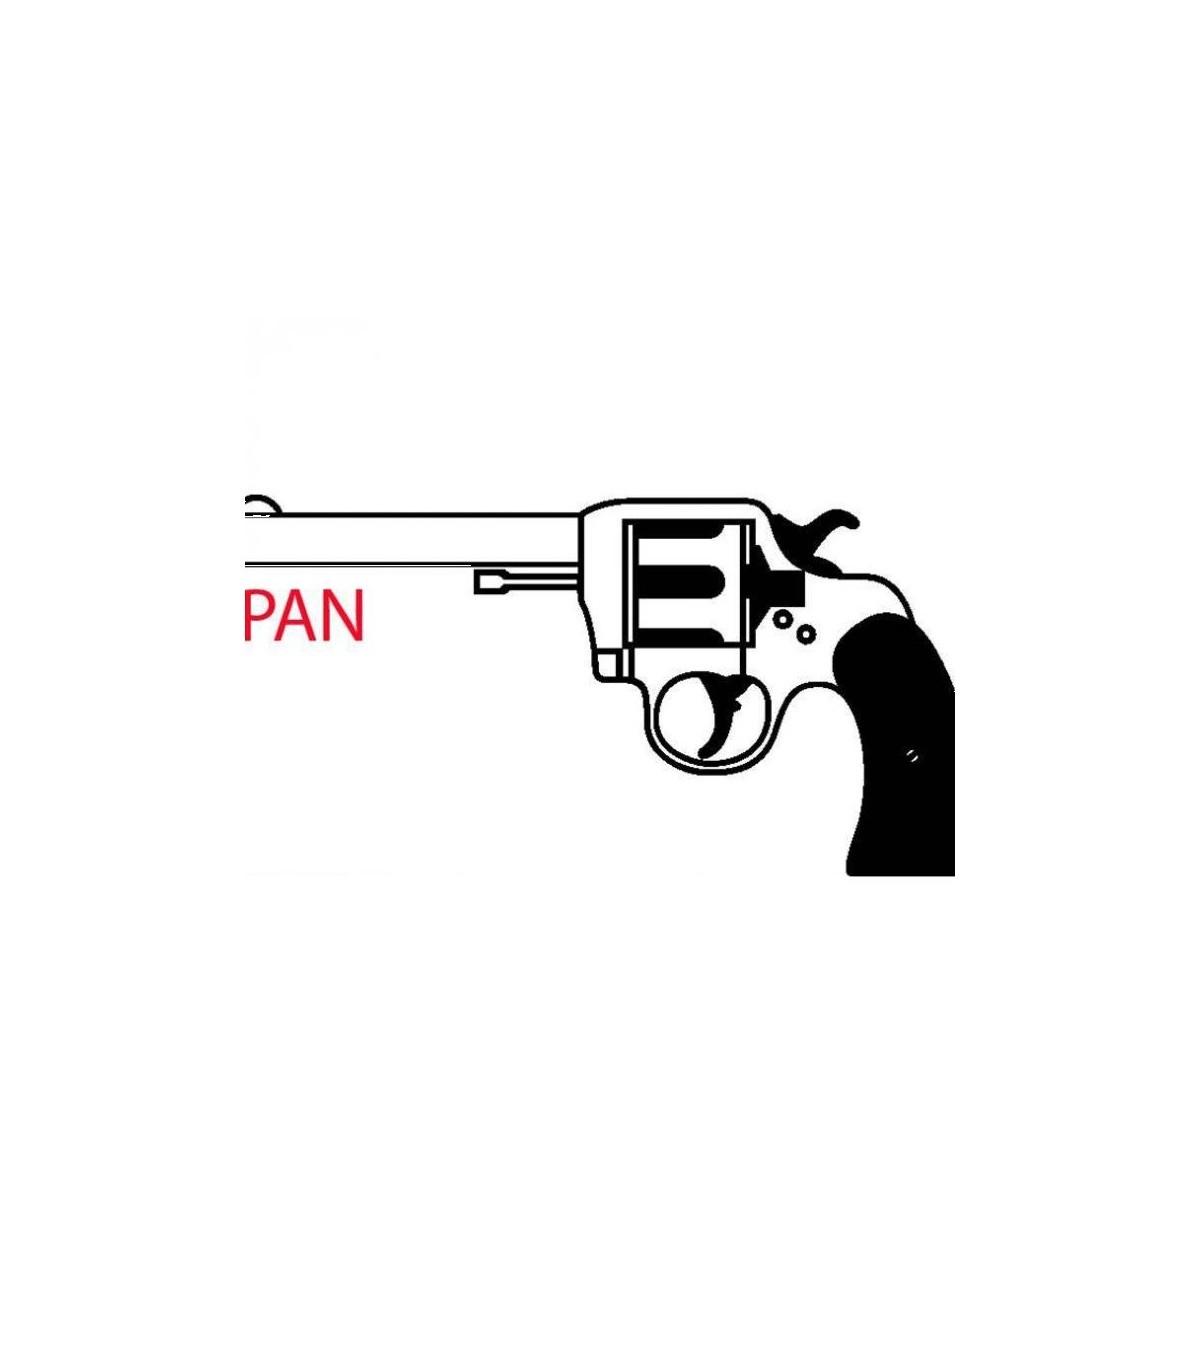 Sticker pan